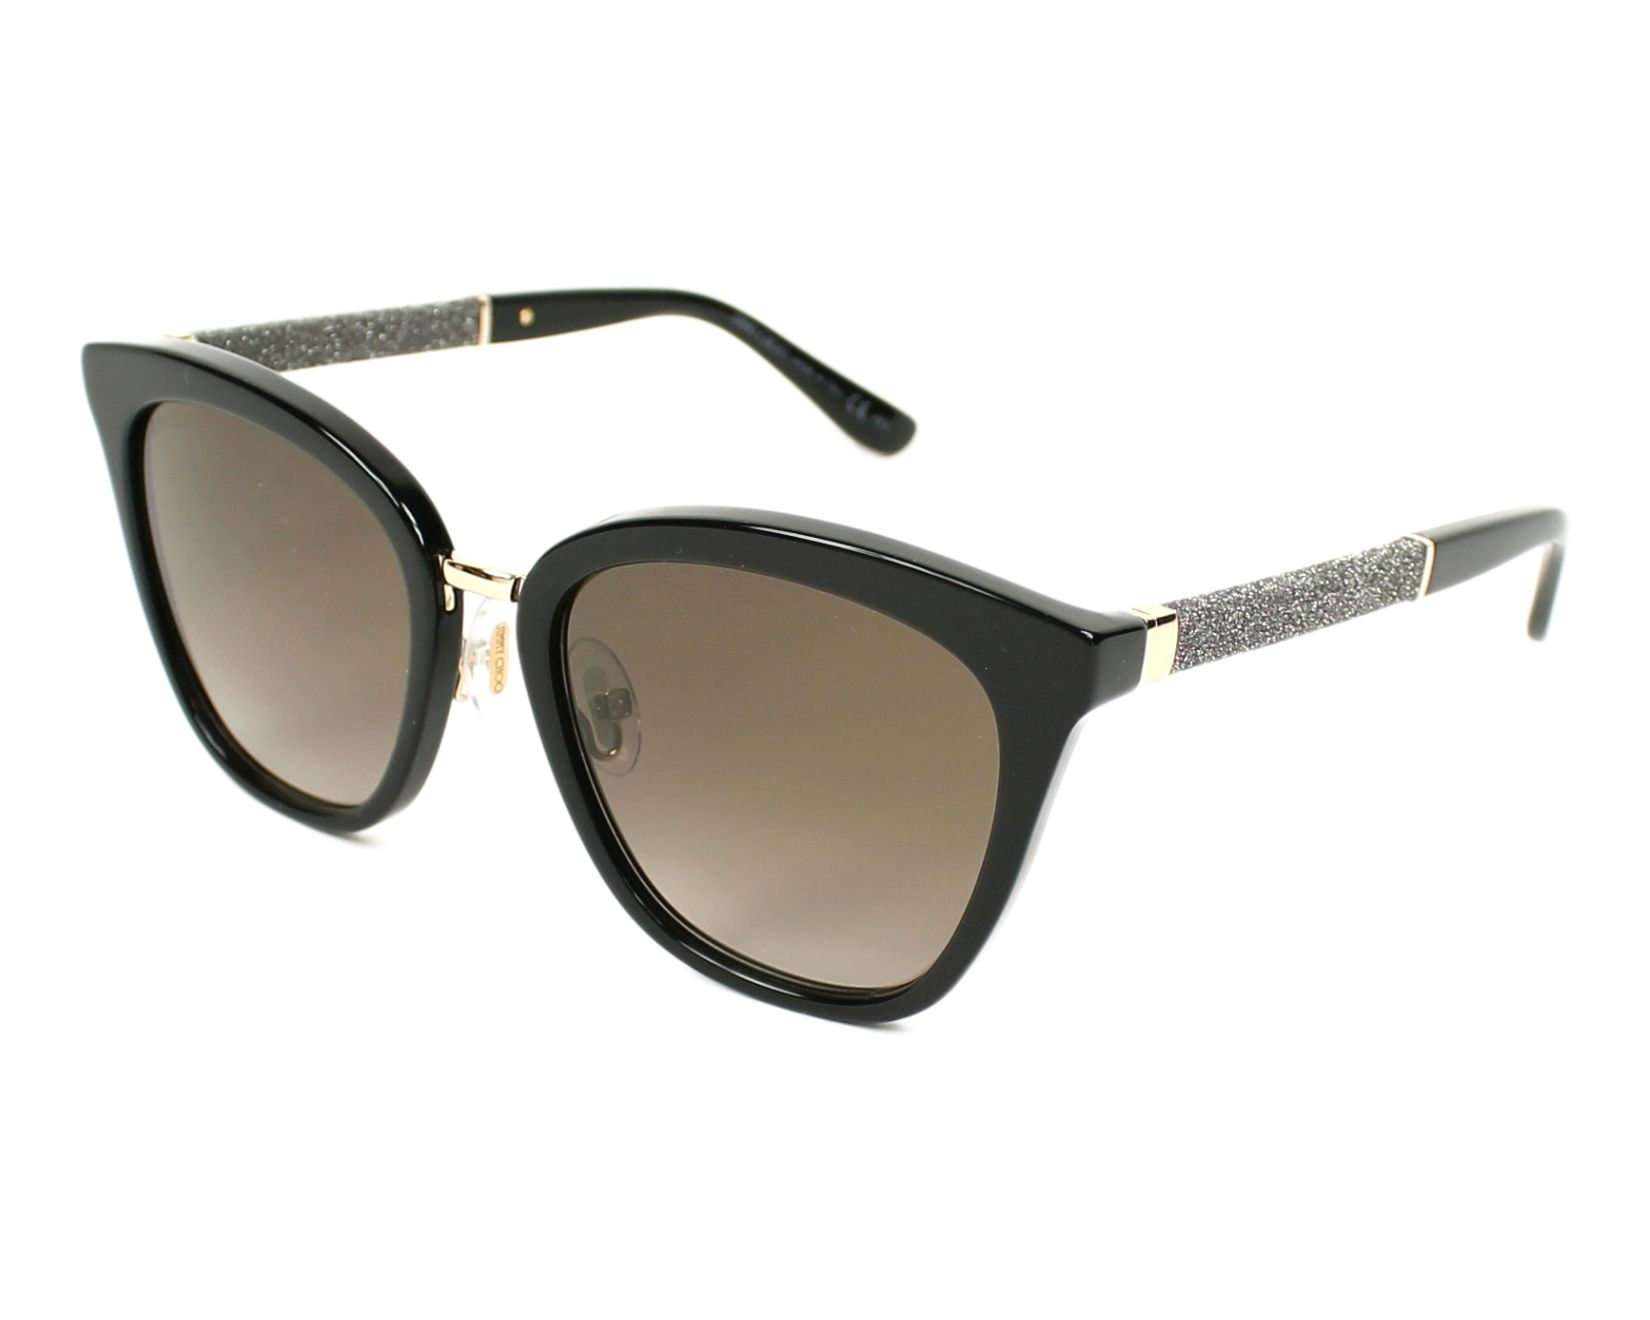 Jimmy Choo Sunglasses FABRY-S KBE/JS